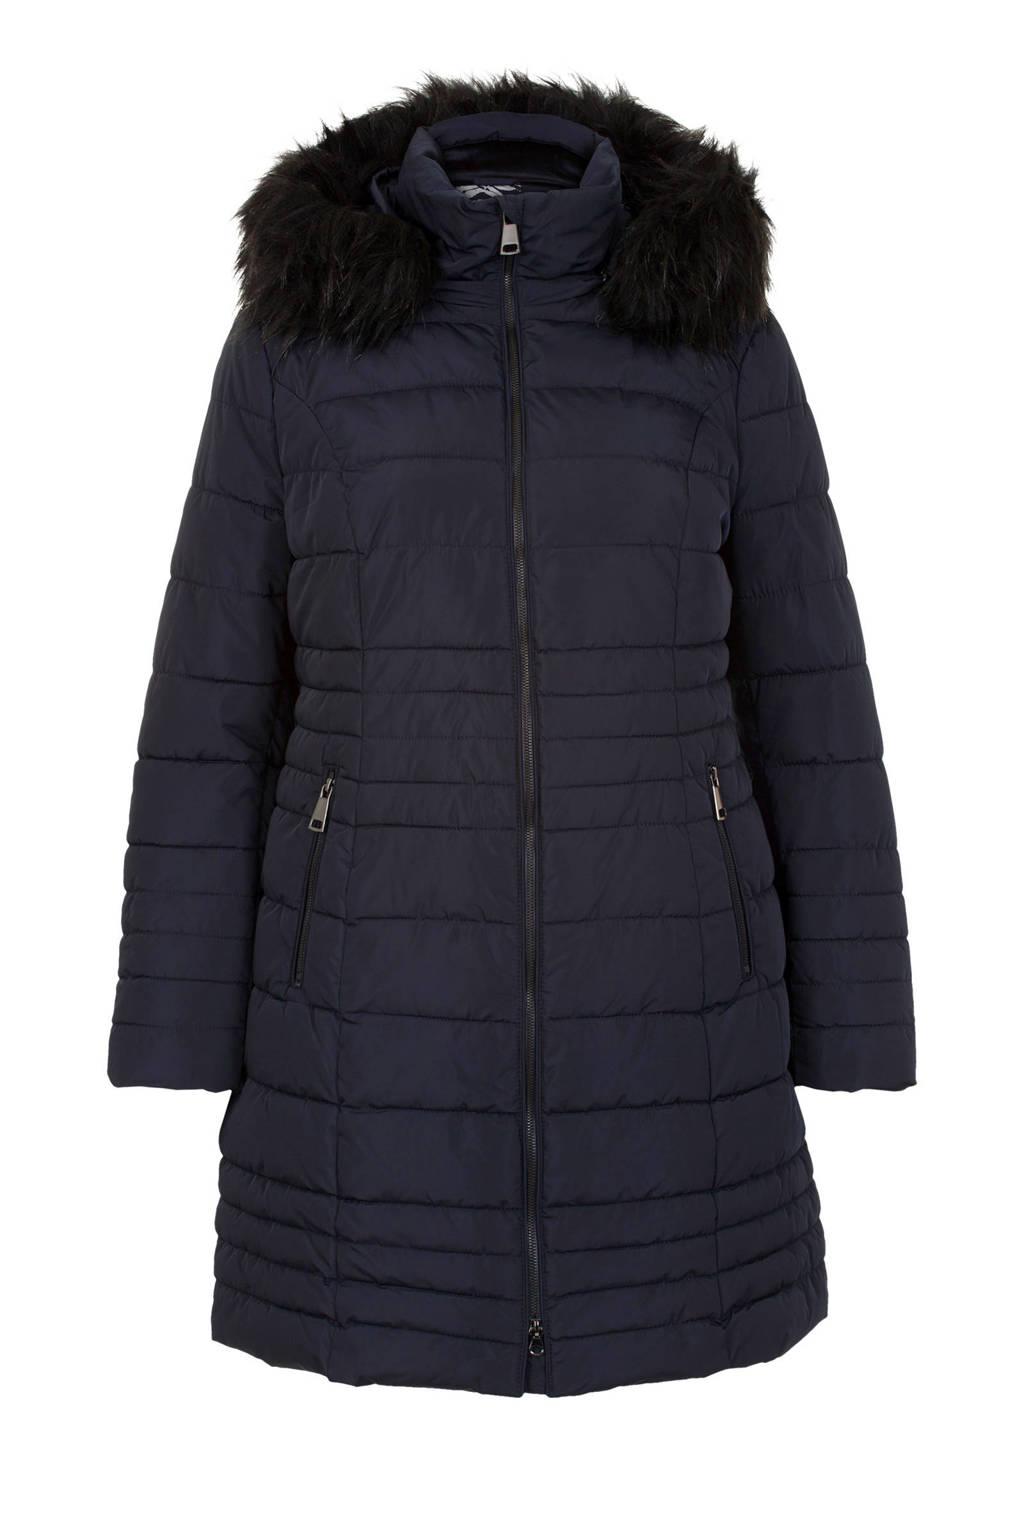 Miss Etam Plus winterjas donkerblauw, Donkerblauw